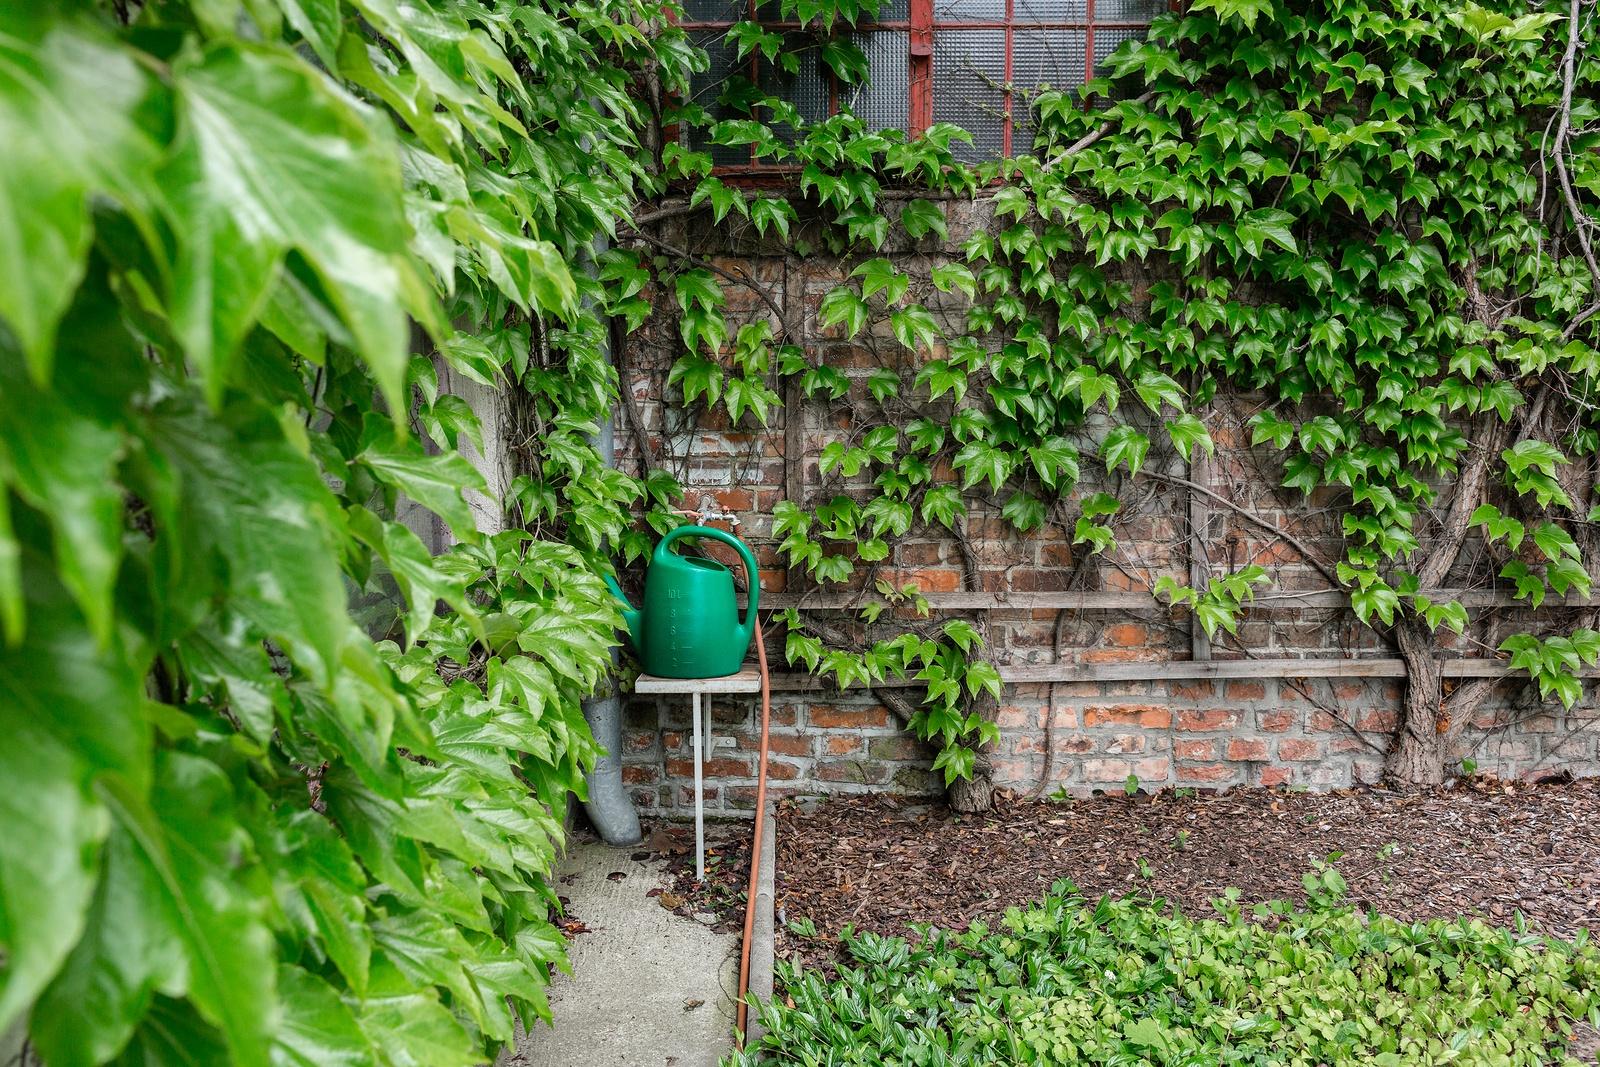 ivy-damage-to-old-brick.jpg